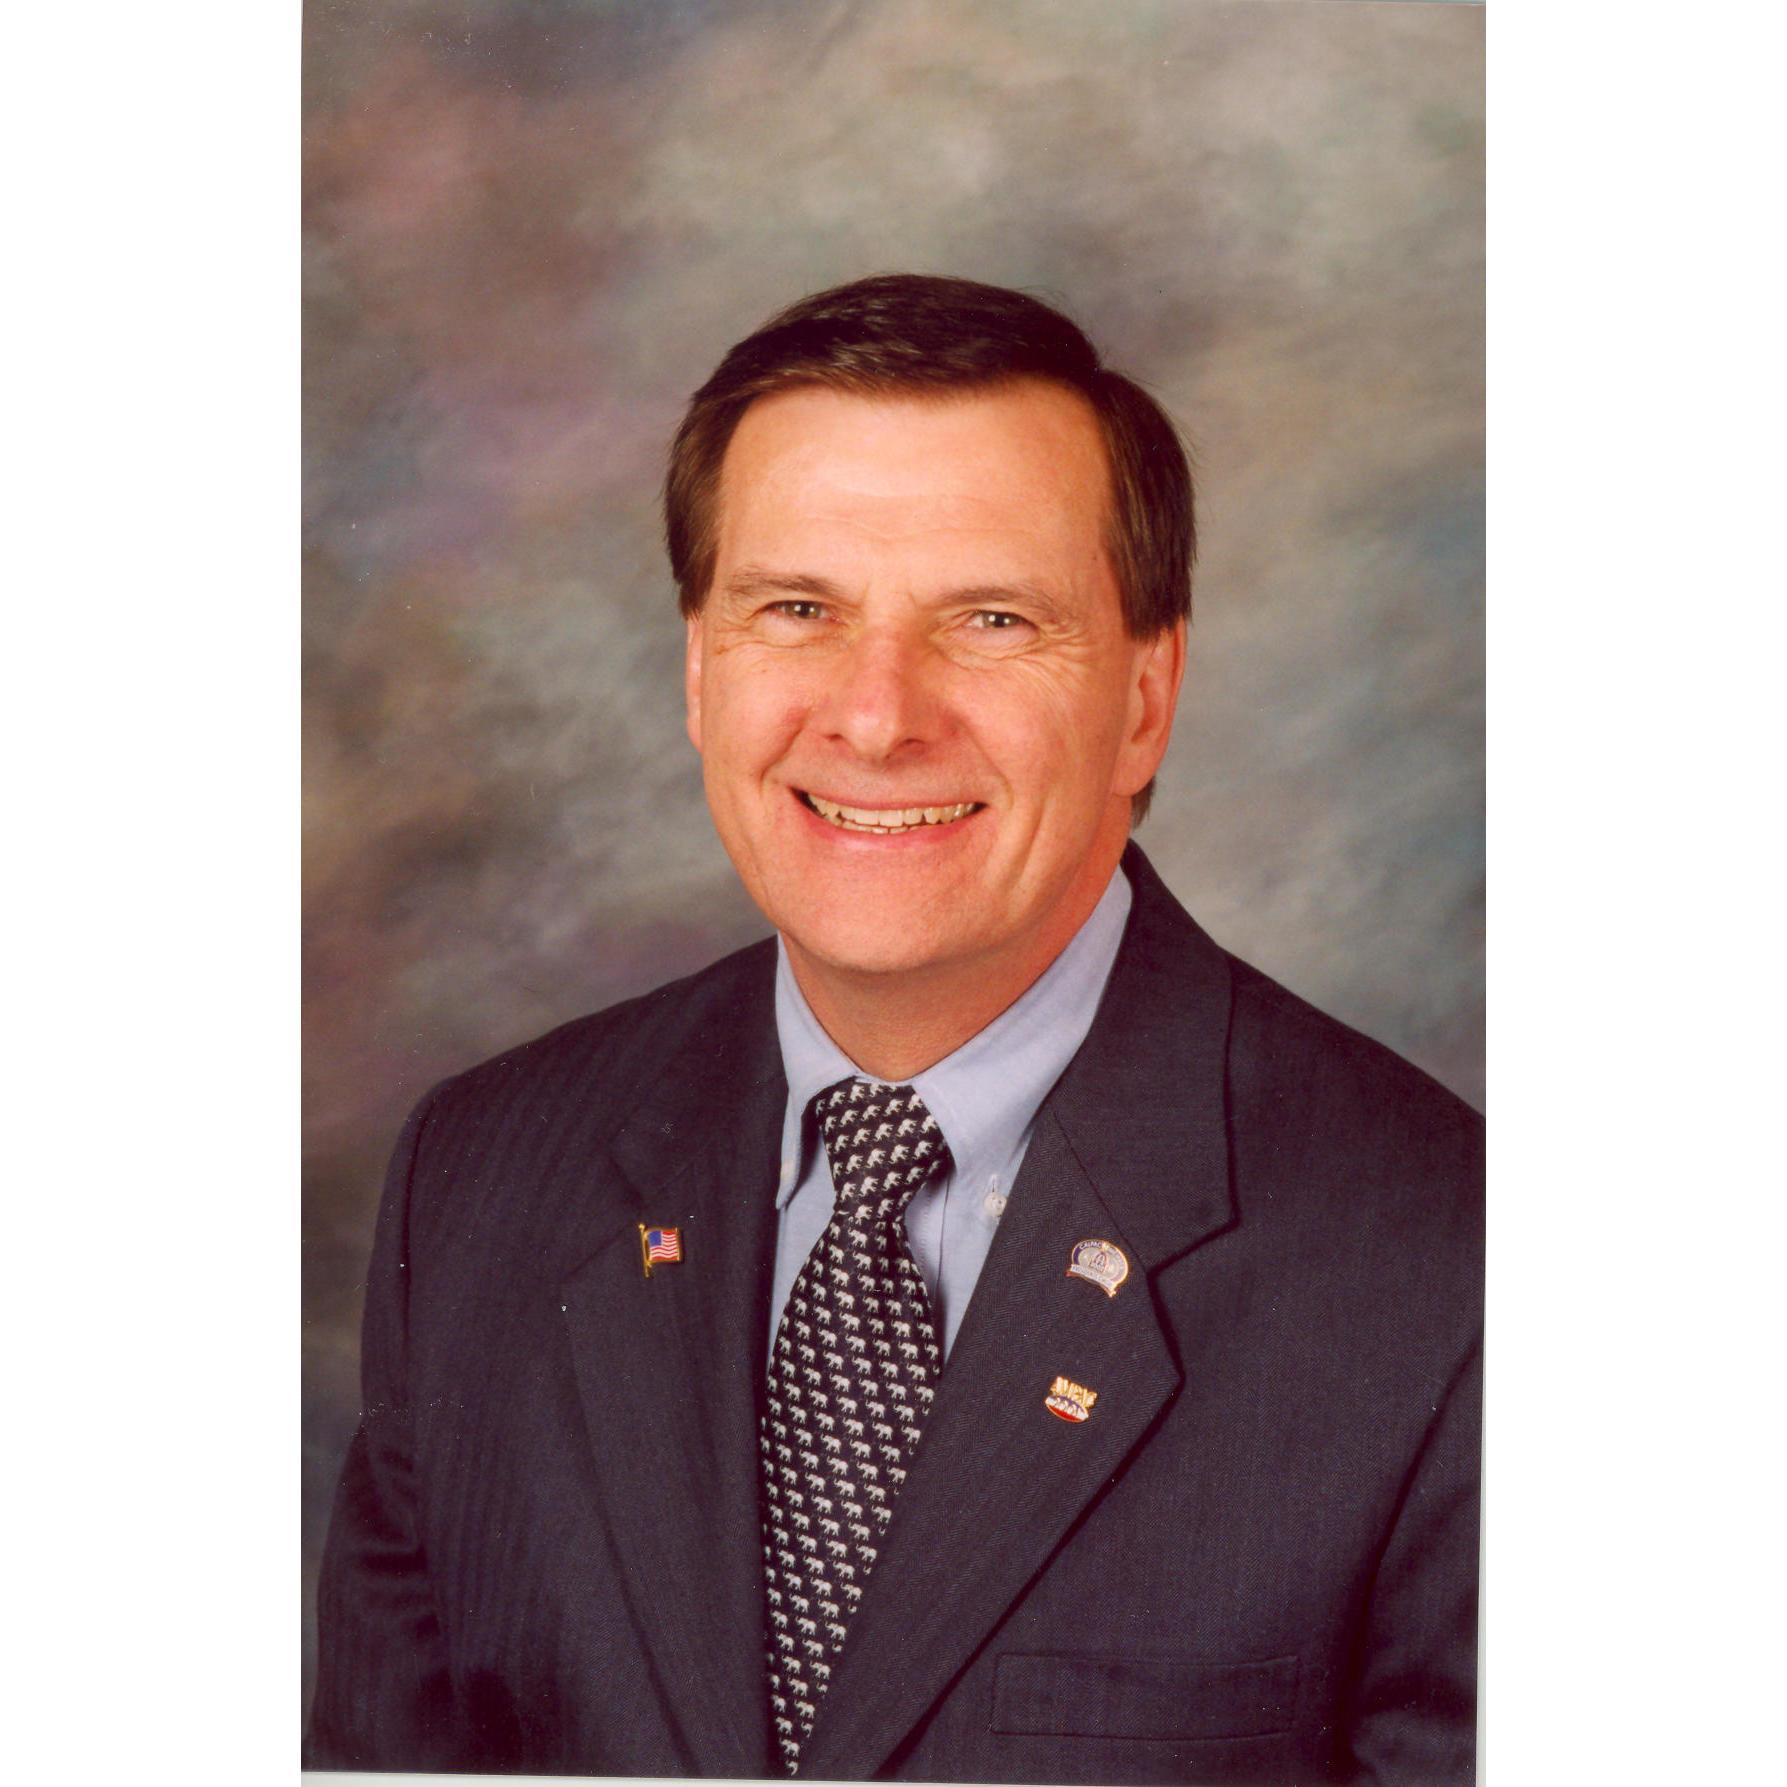 Lytton W. Smith, MD